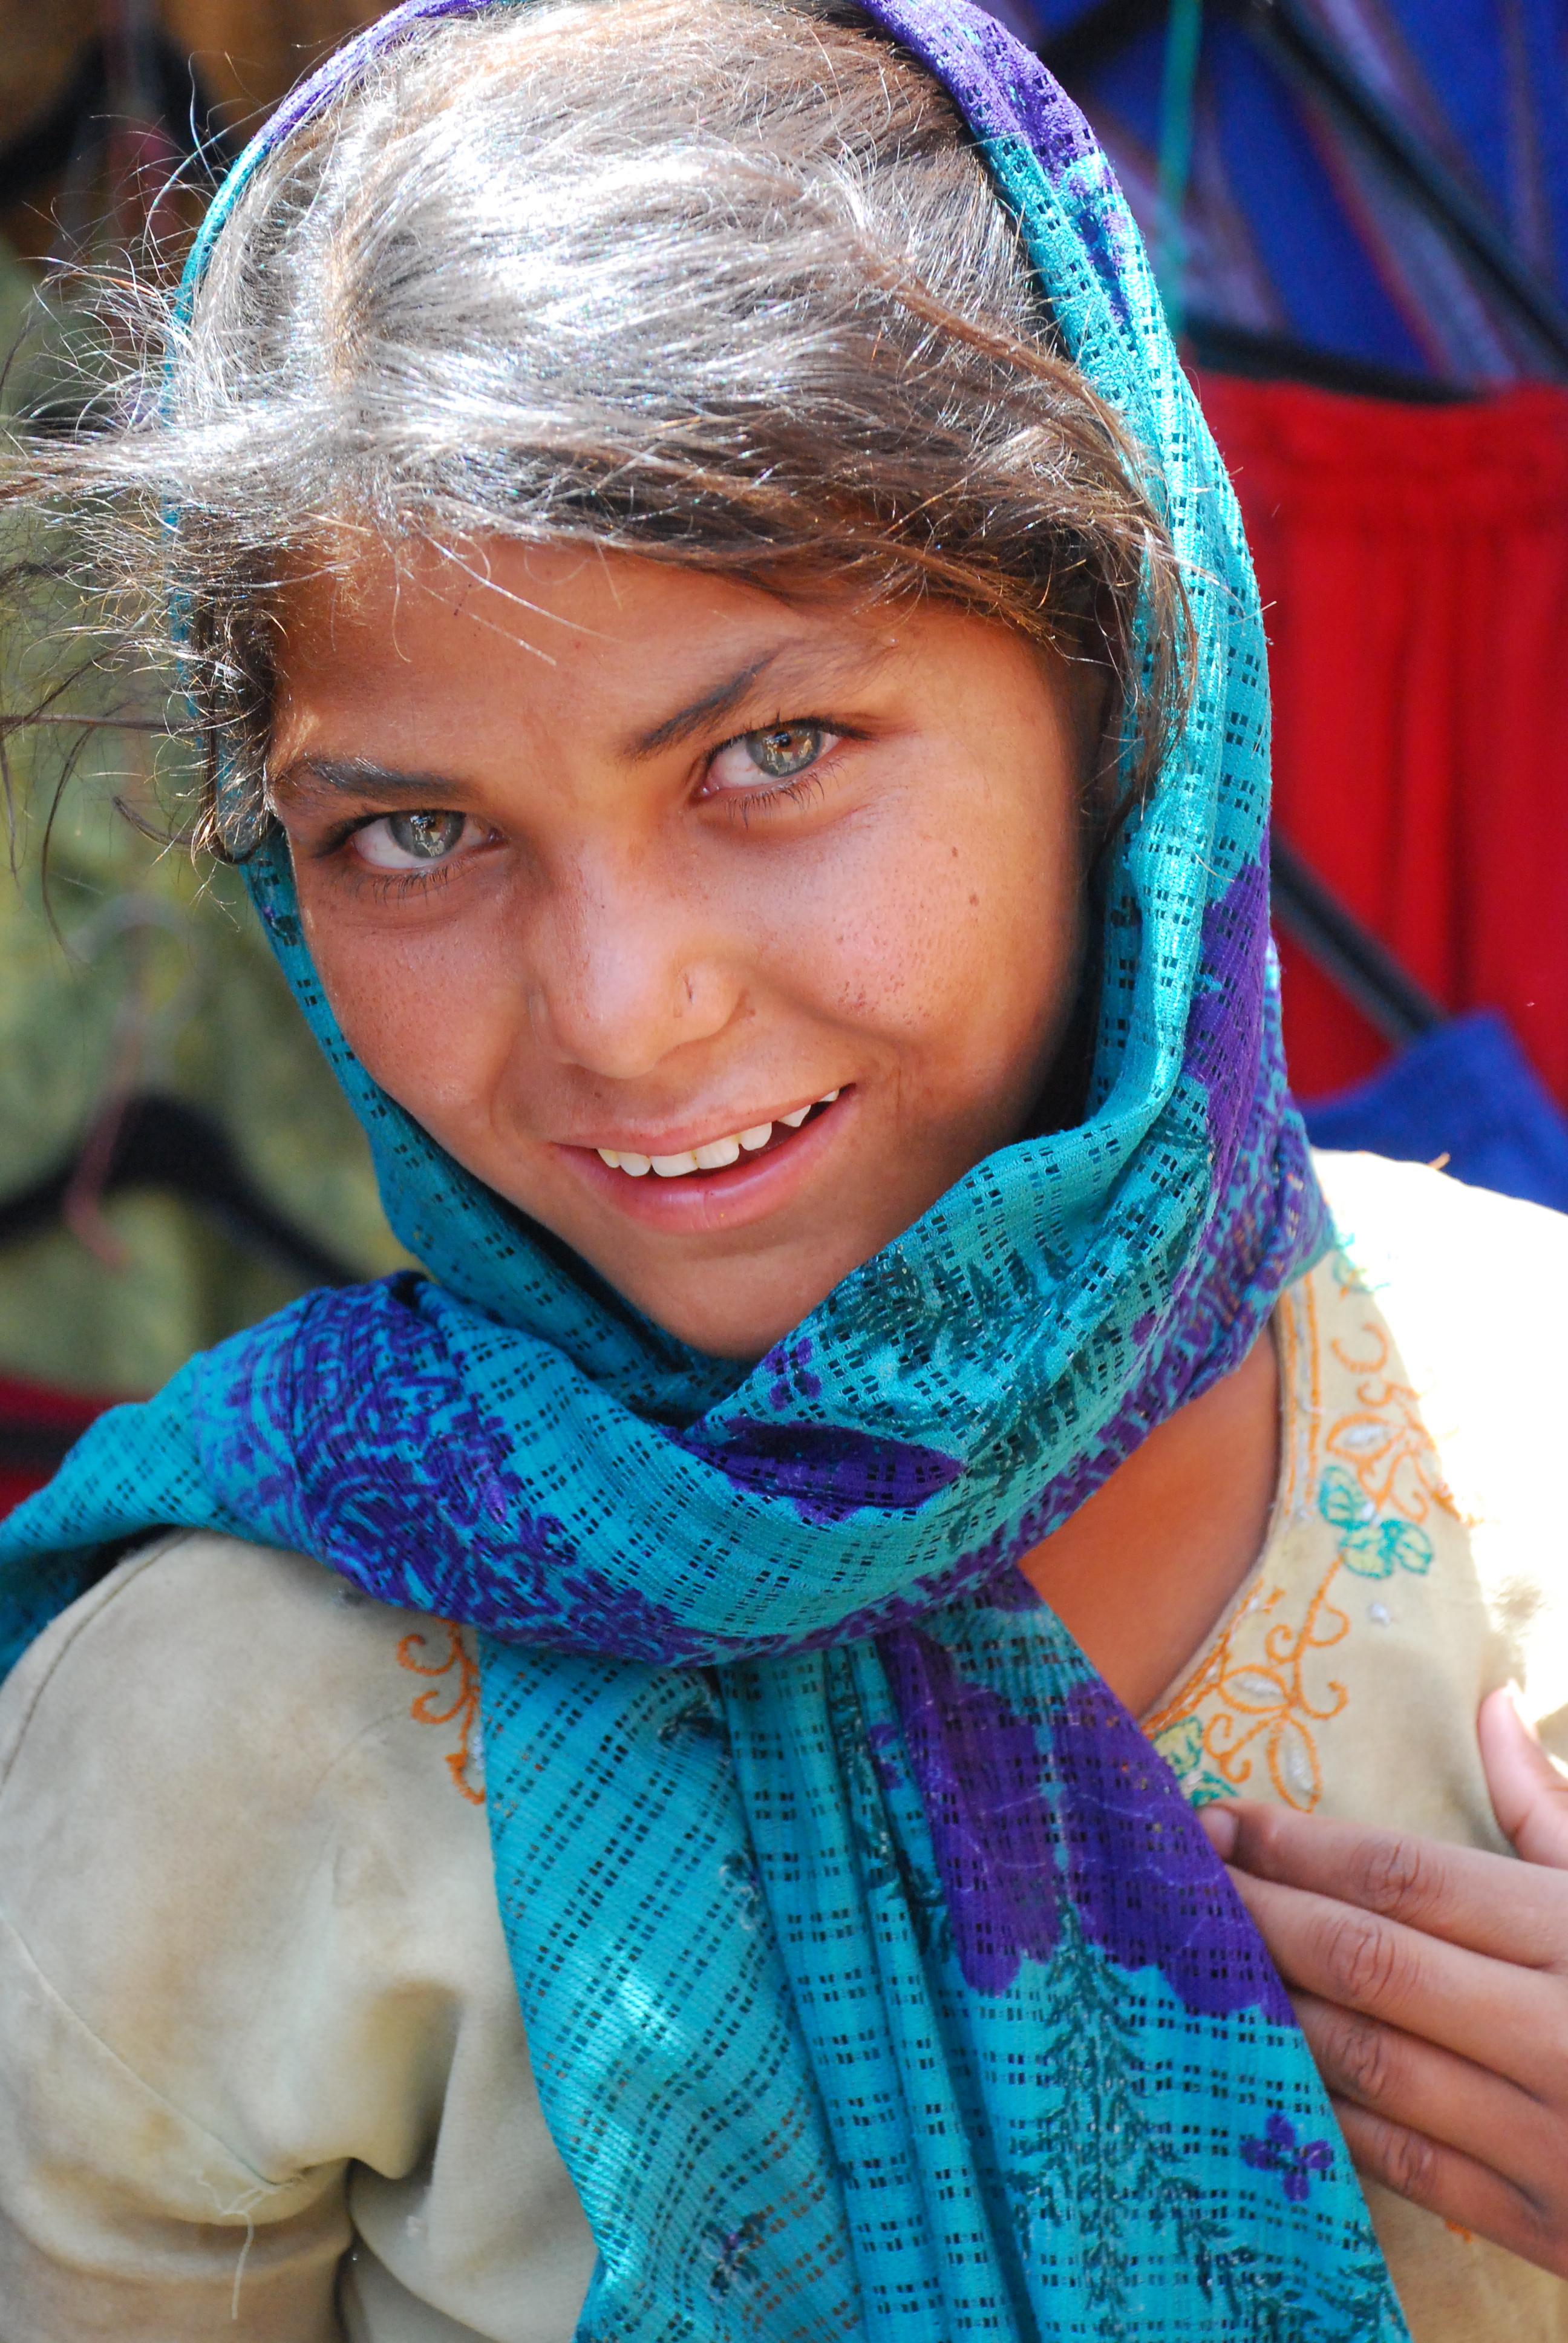 Gypsy Girl, India